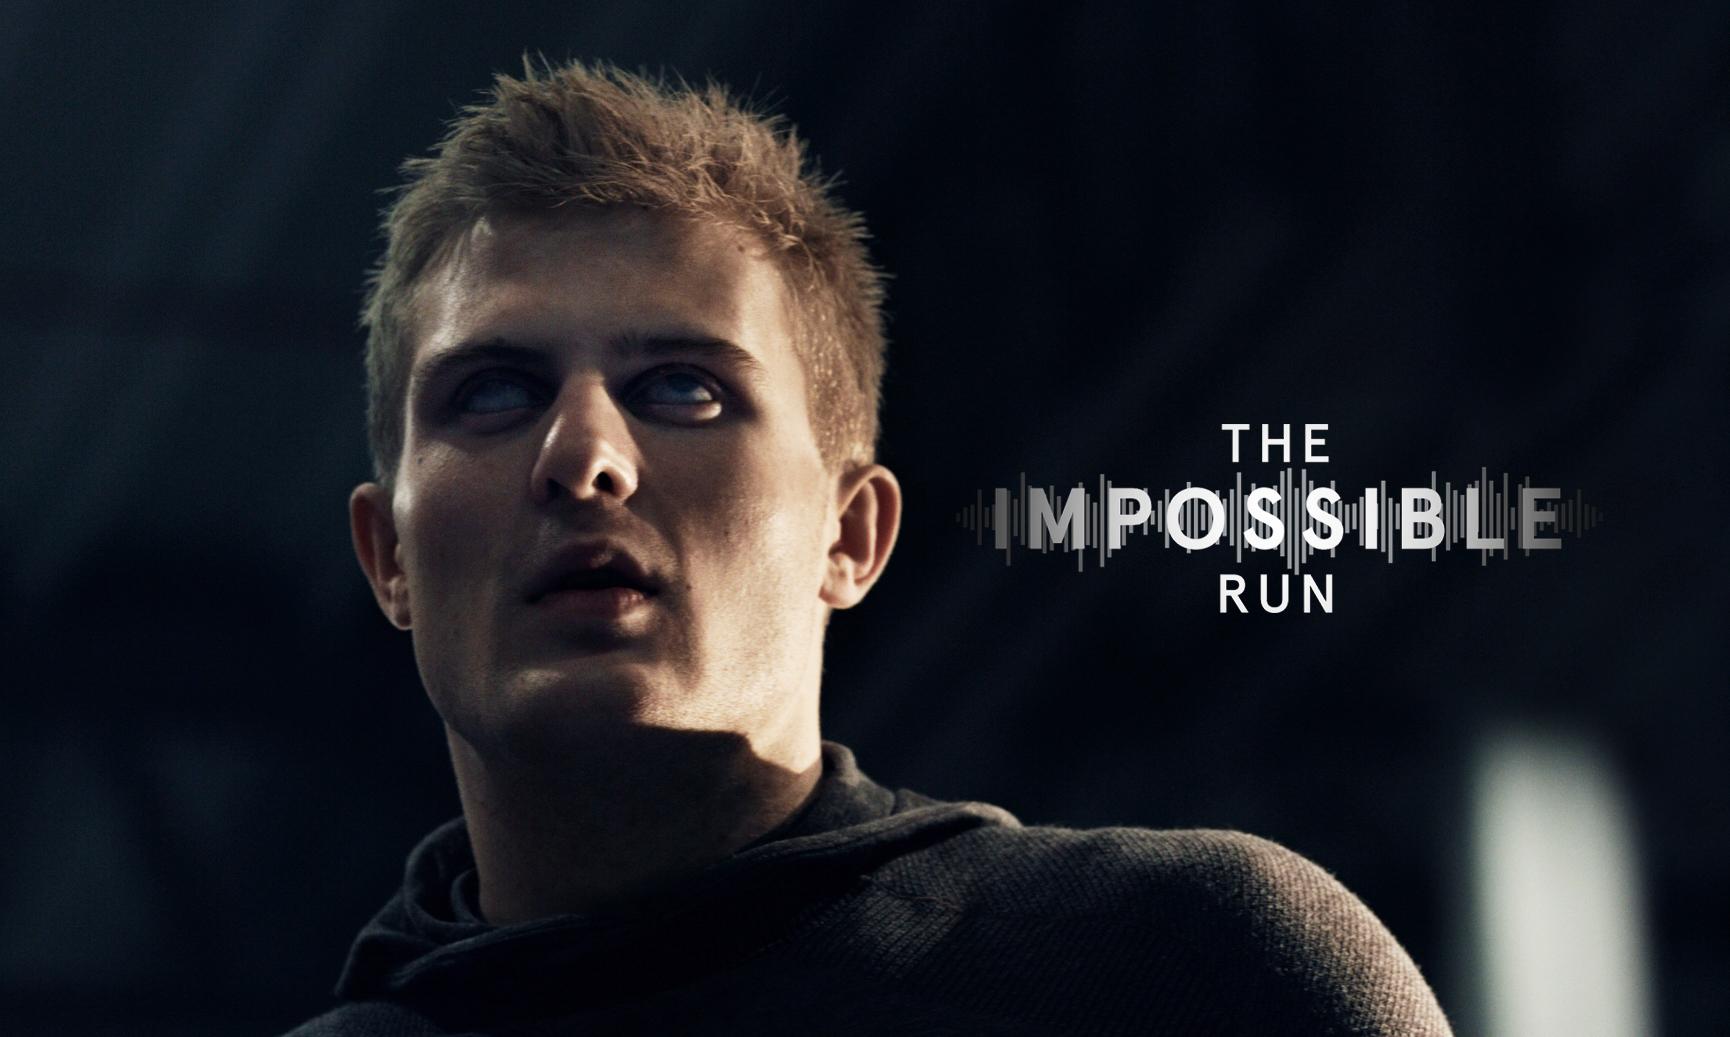 The Imposible Run